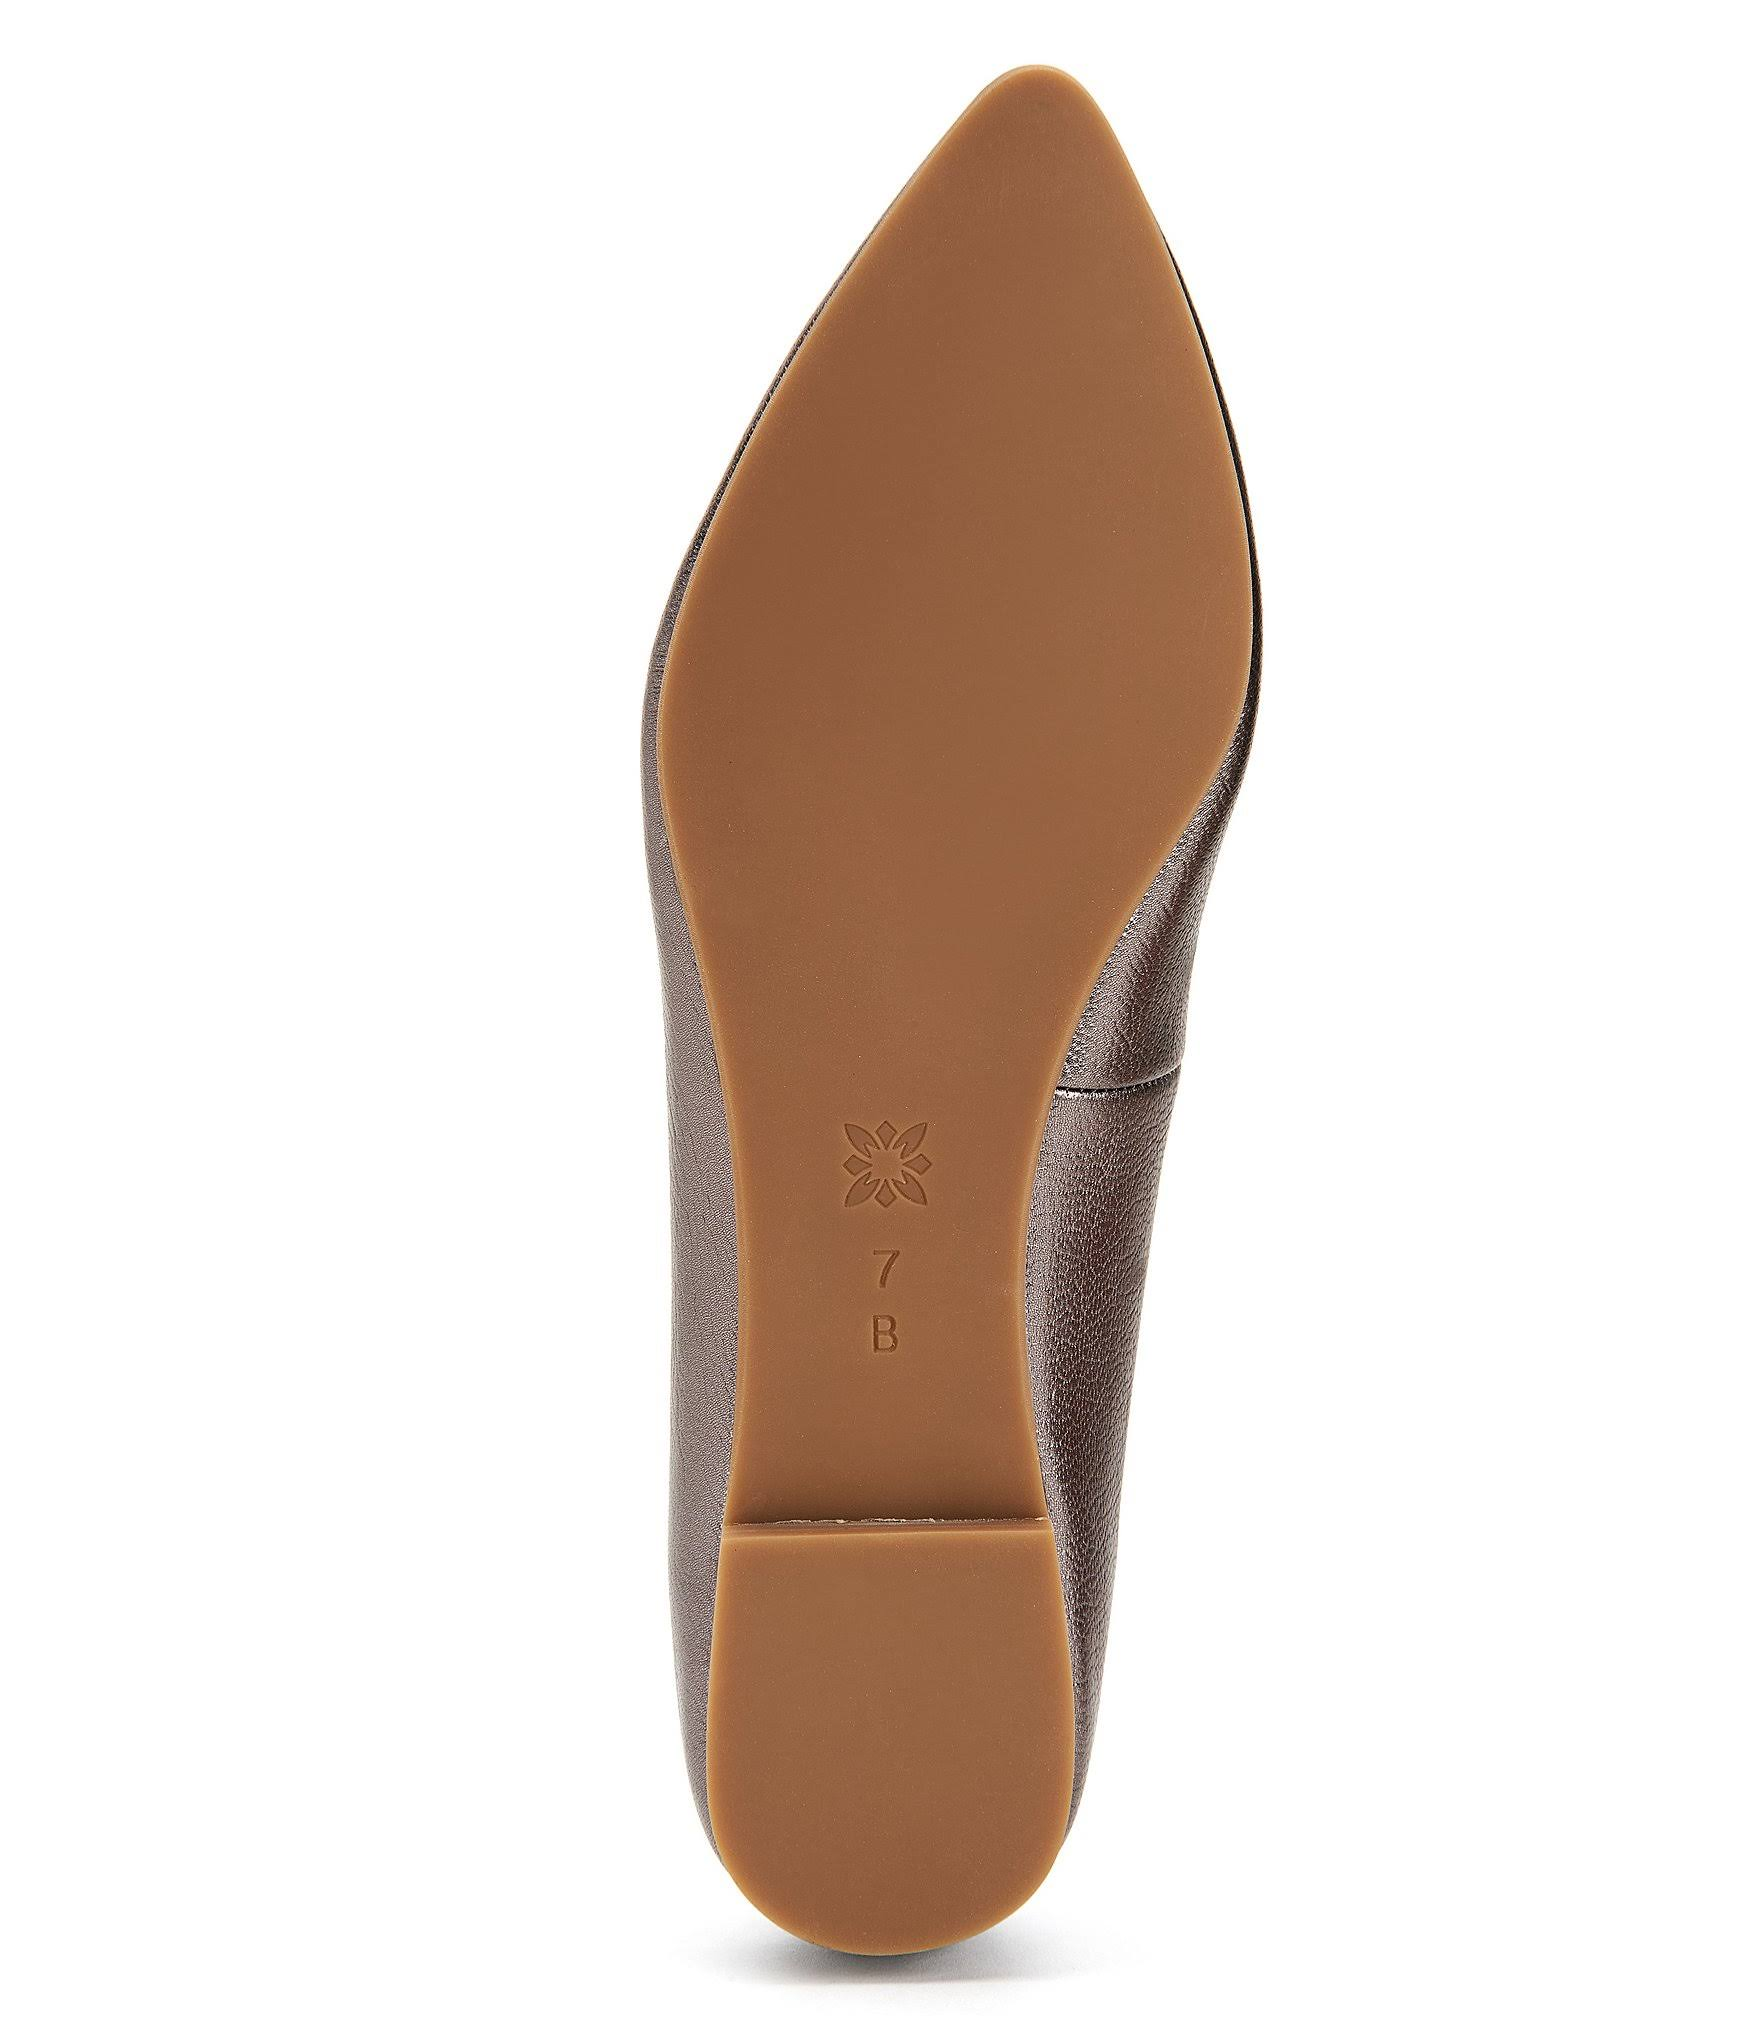 Millie Women's 5 5m Bcbgeneration Leather FlatGunmetal 8PknwOX0